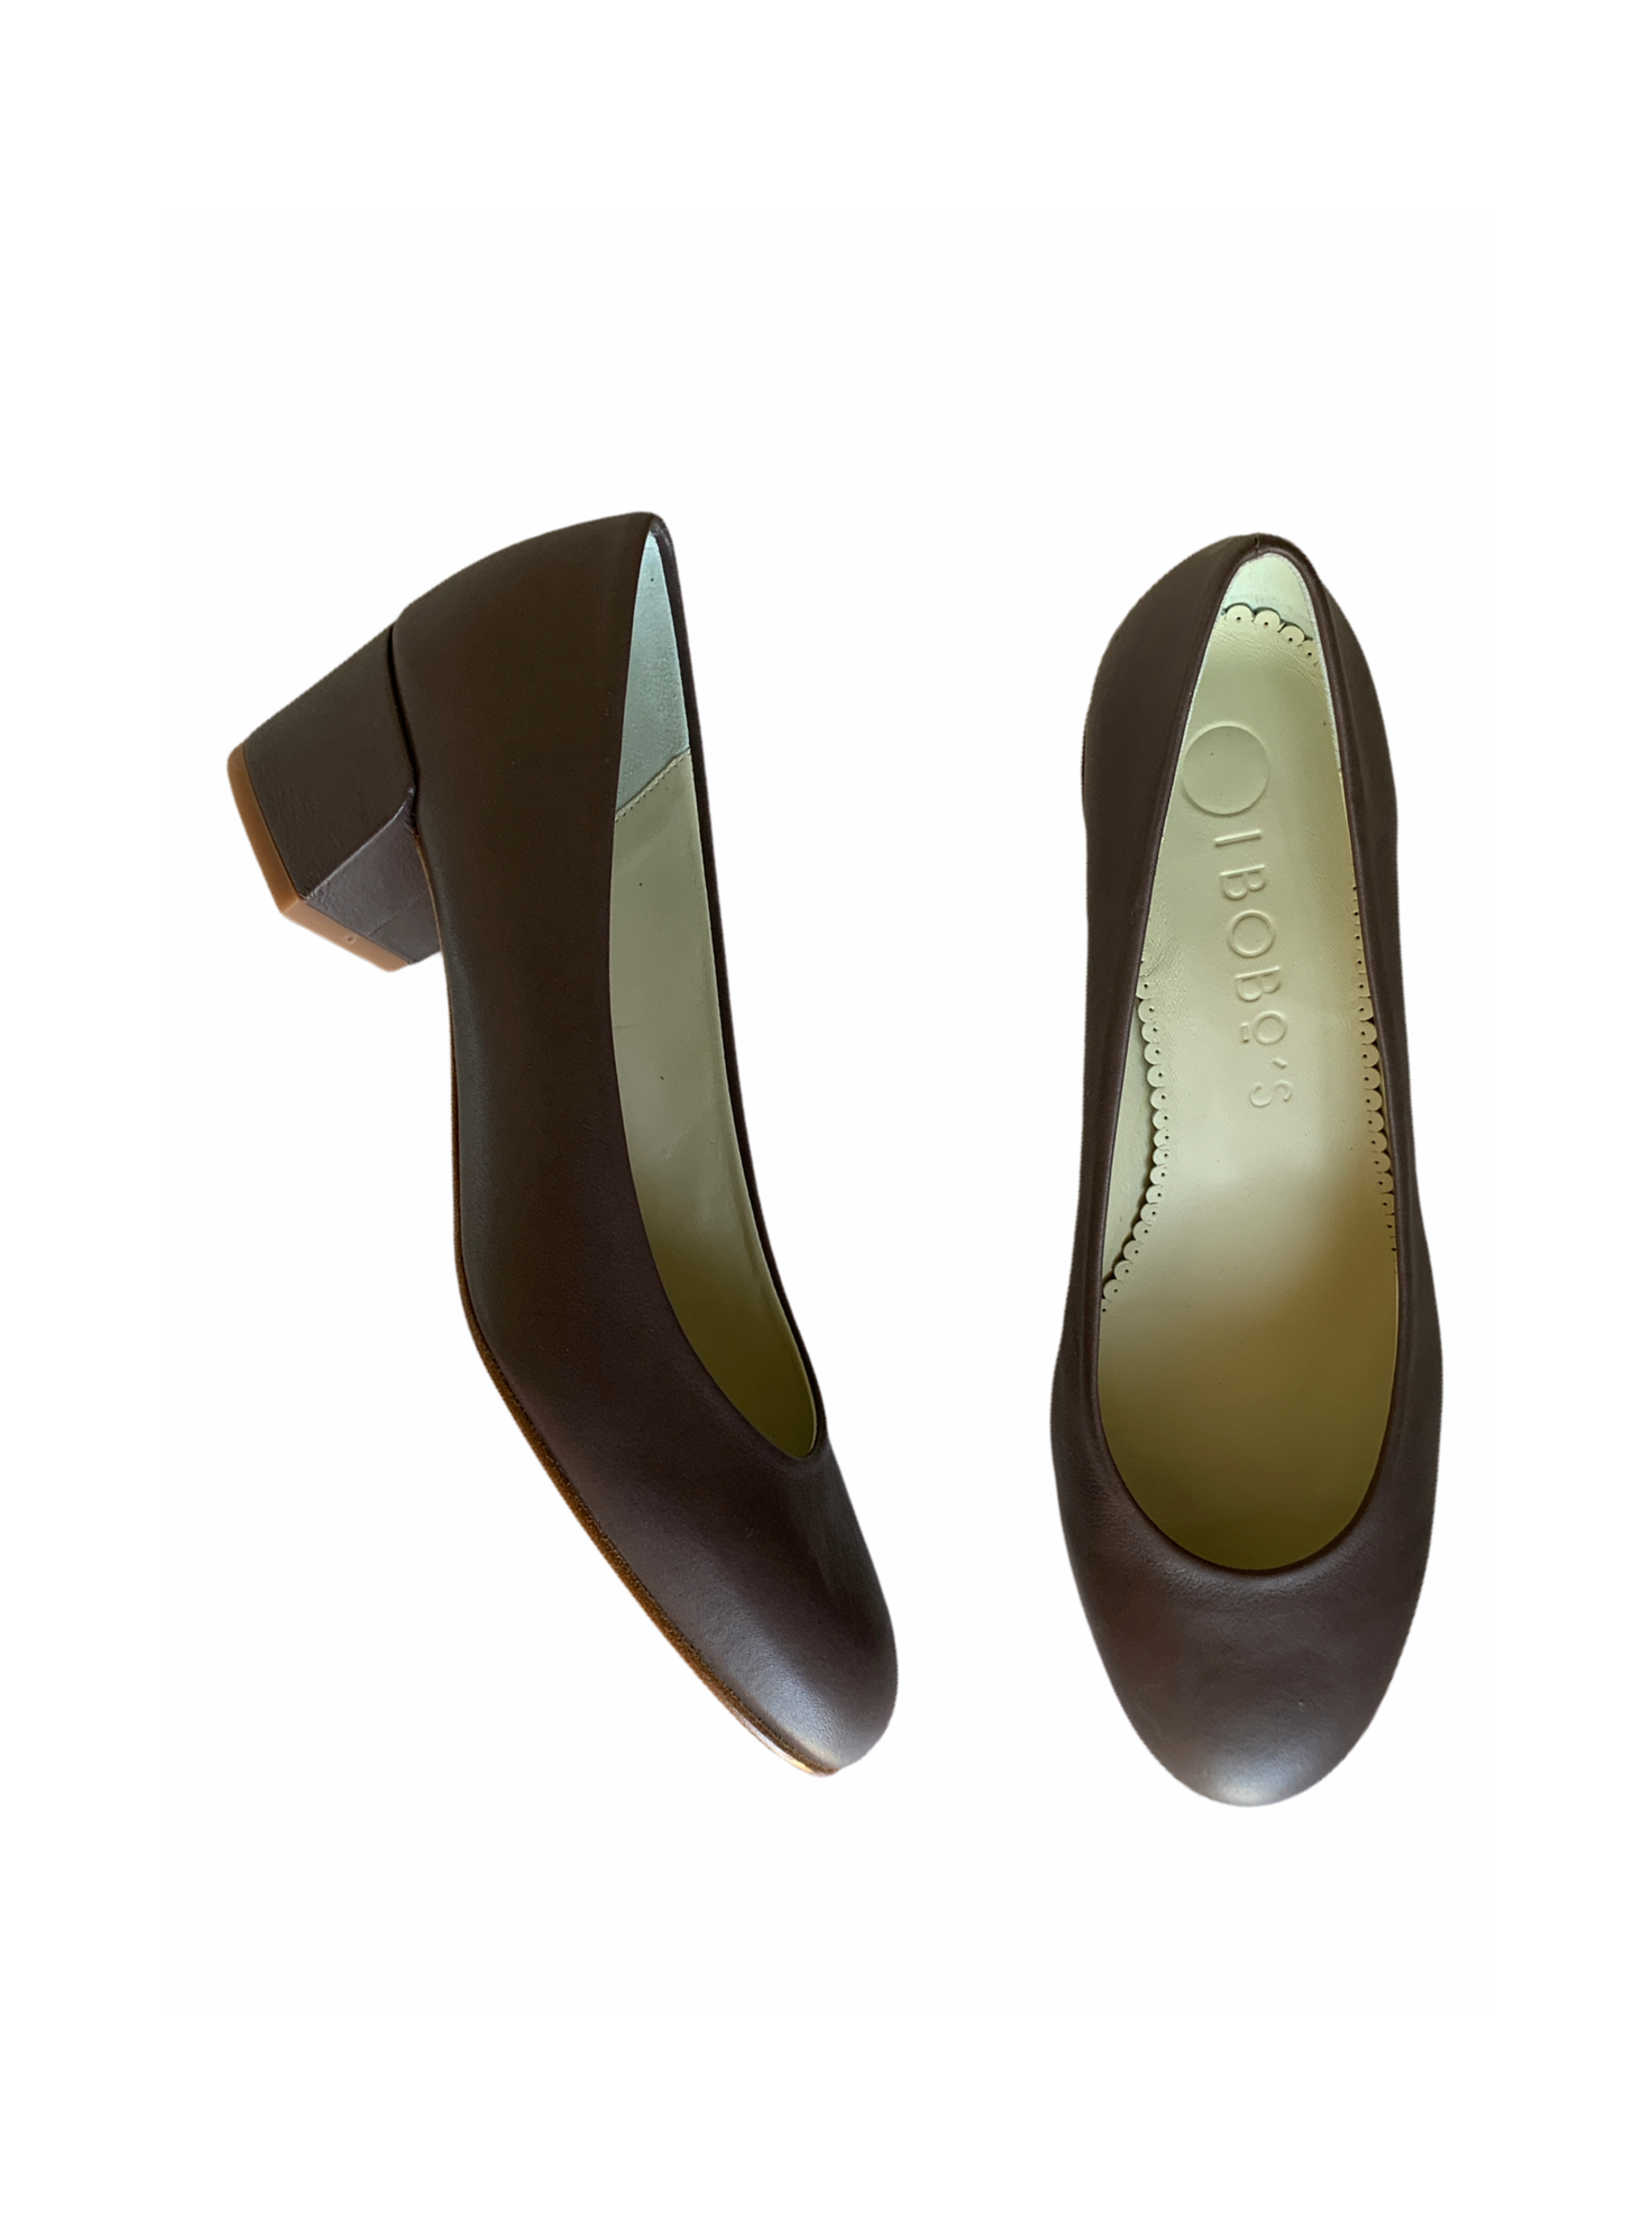 Zapato Tacon medio Vison piel